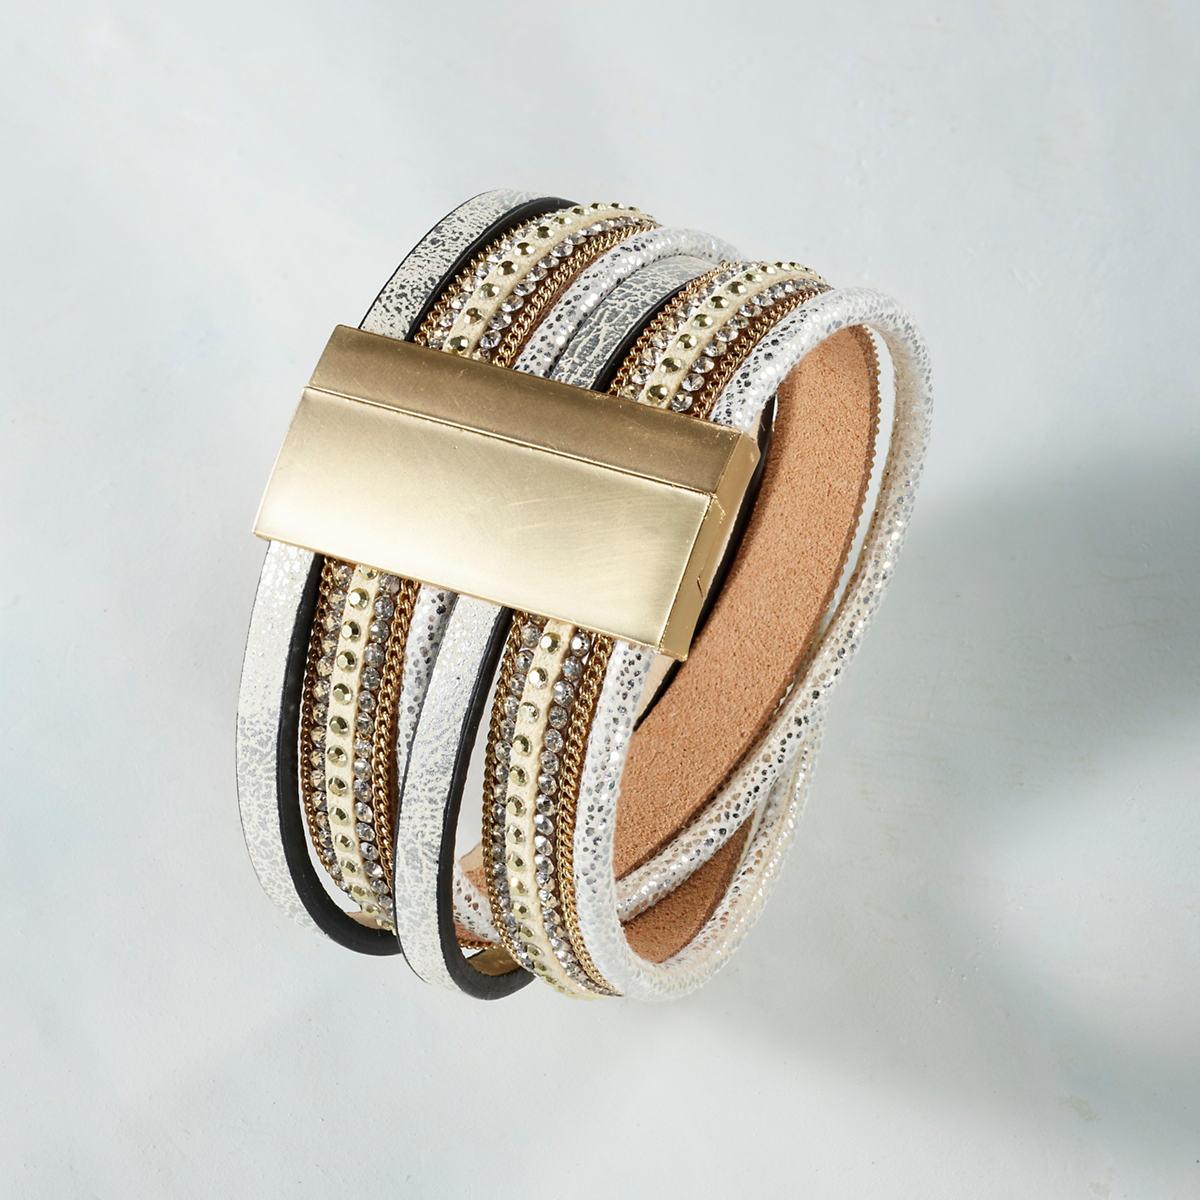 Giselle Silver Bracelet